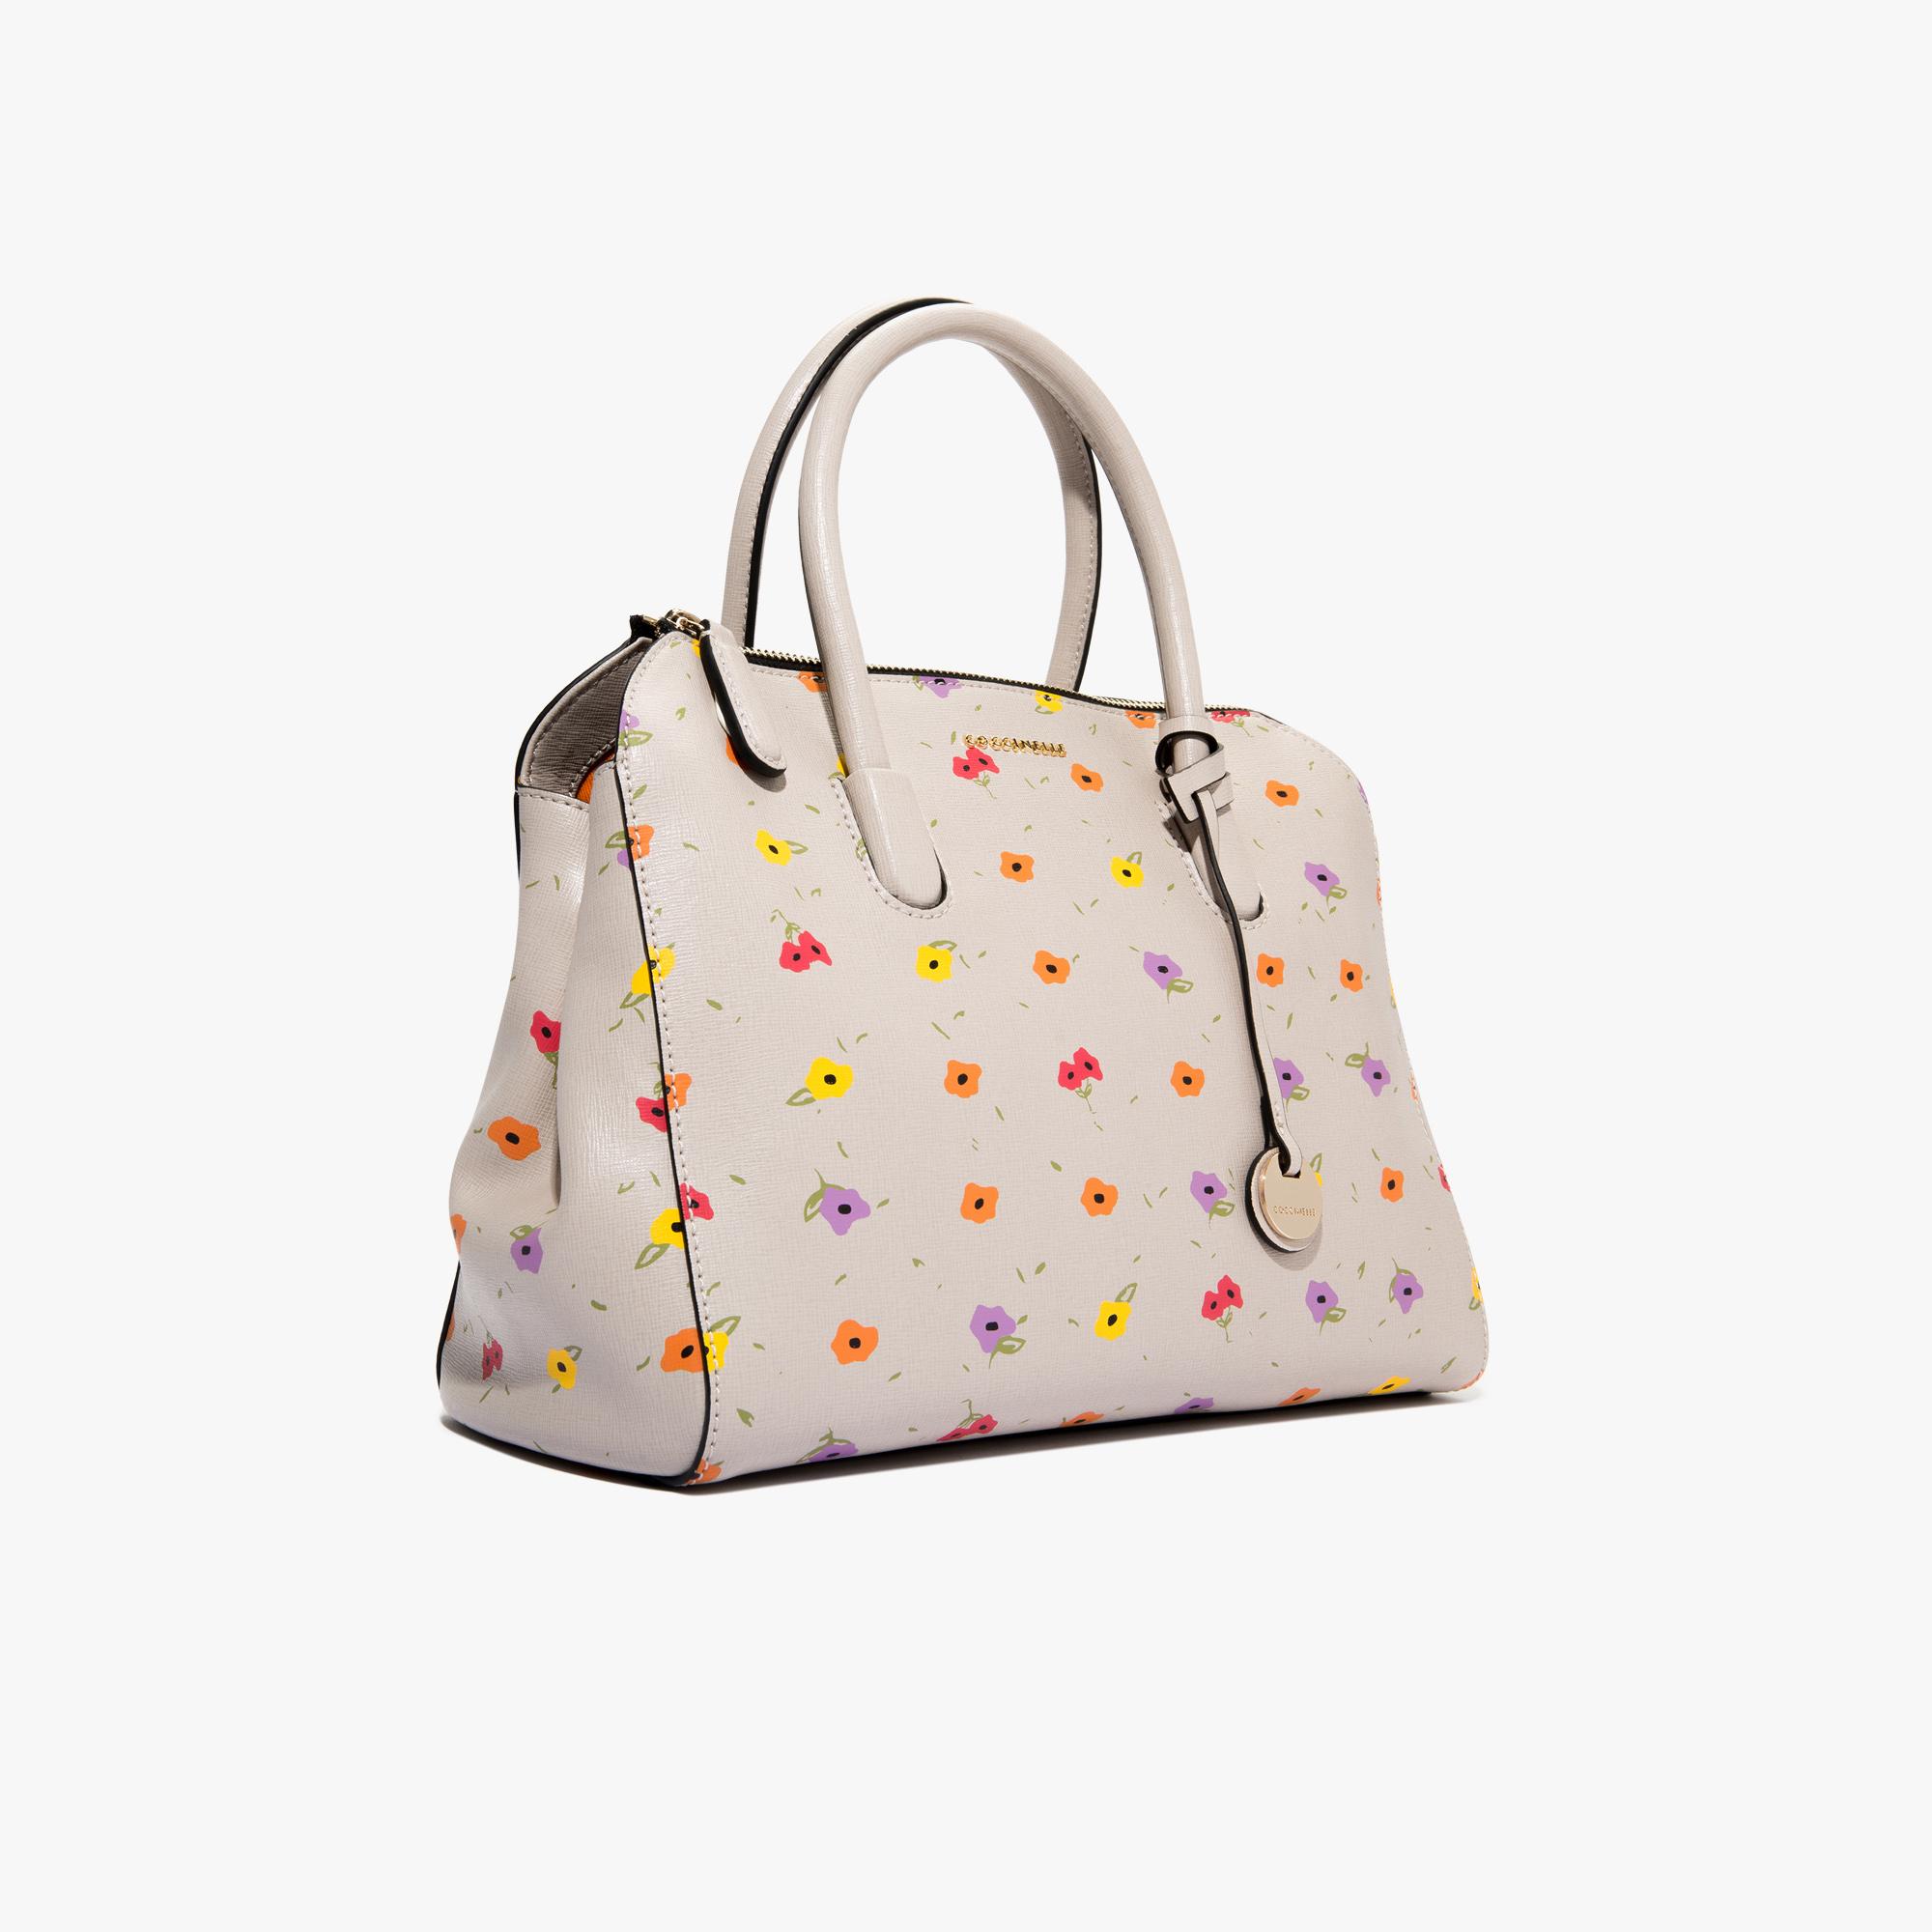 Clementine printed saffiano leather handbag